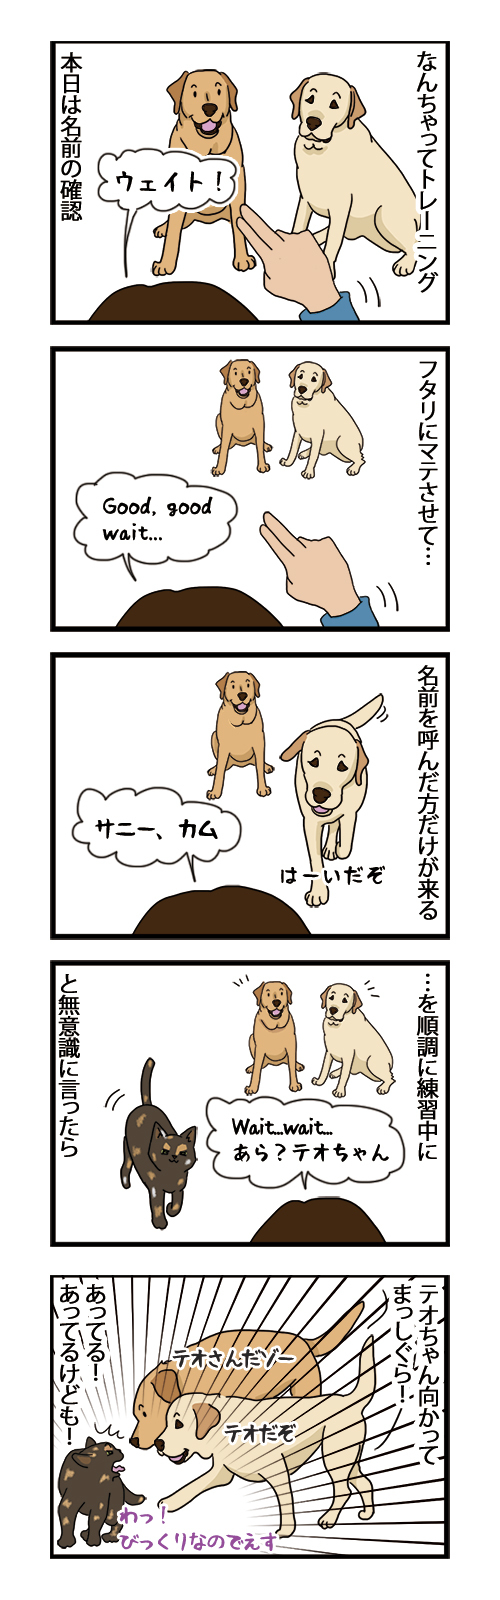 11022021_dogcomic.jpg